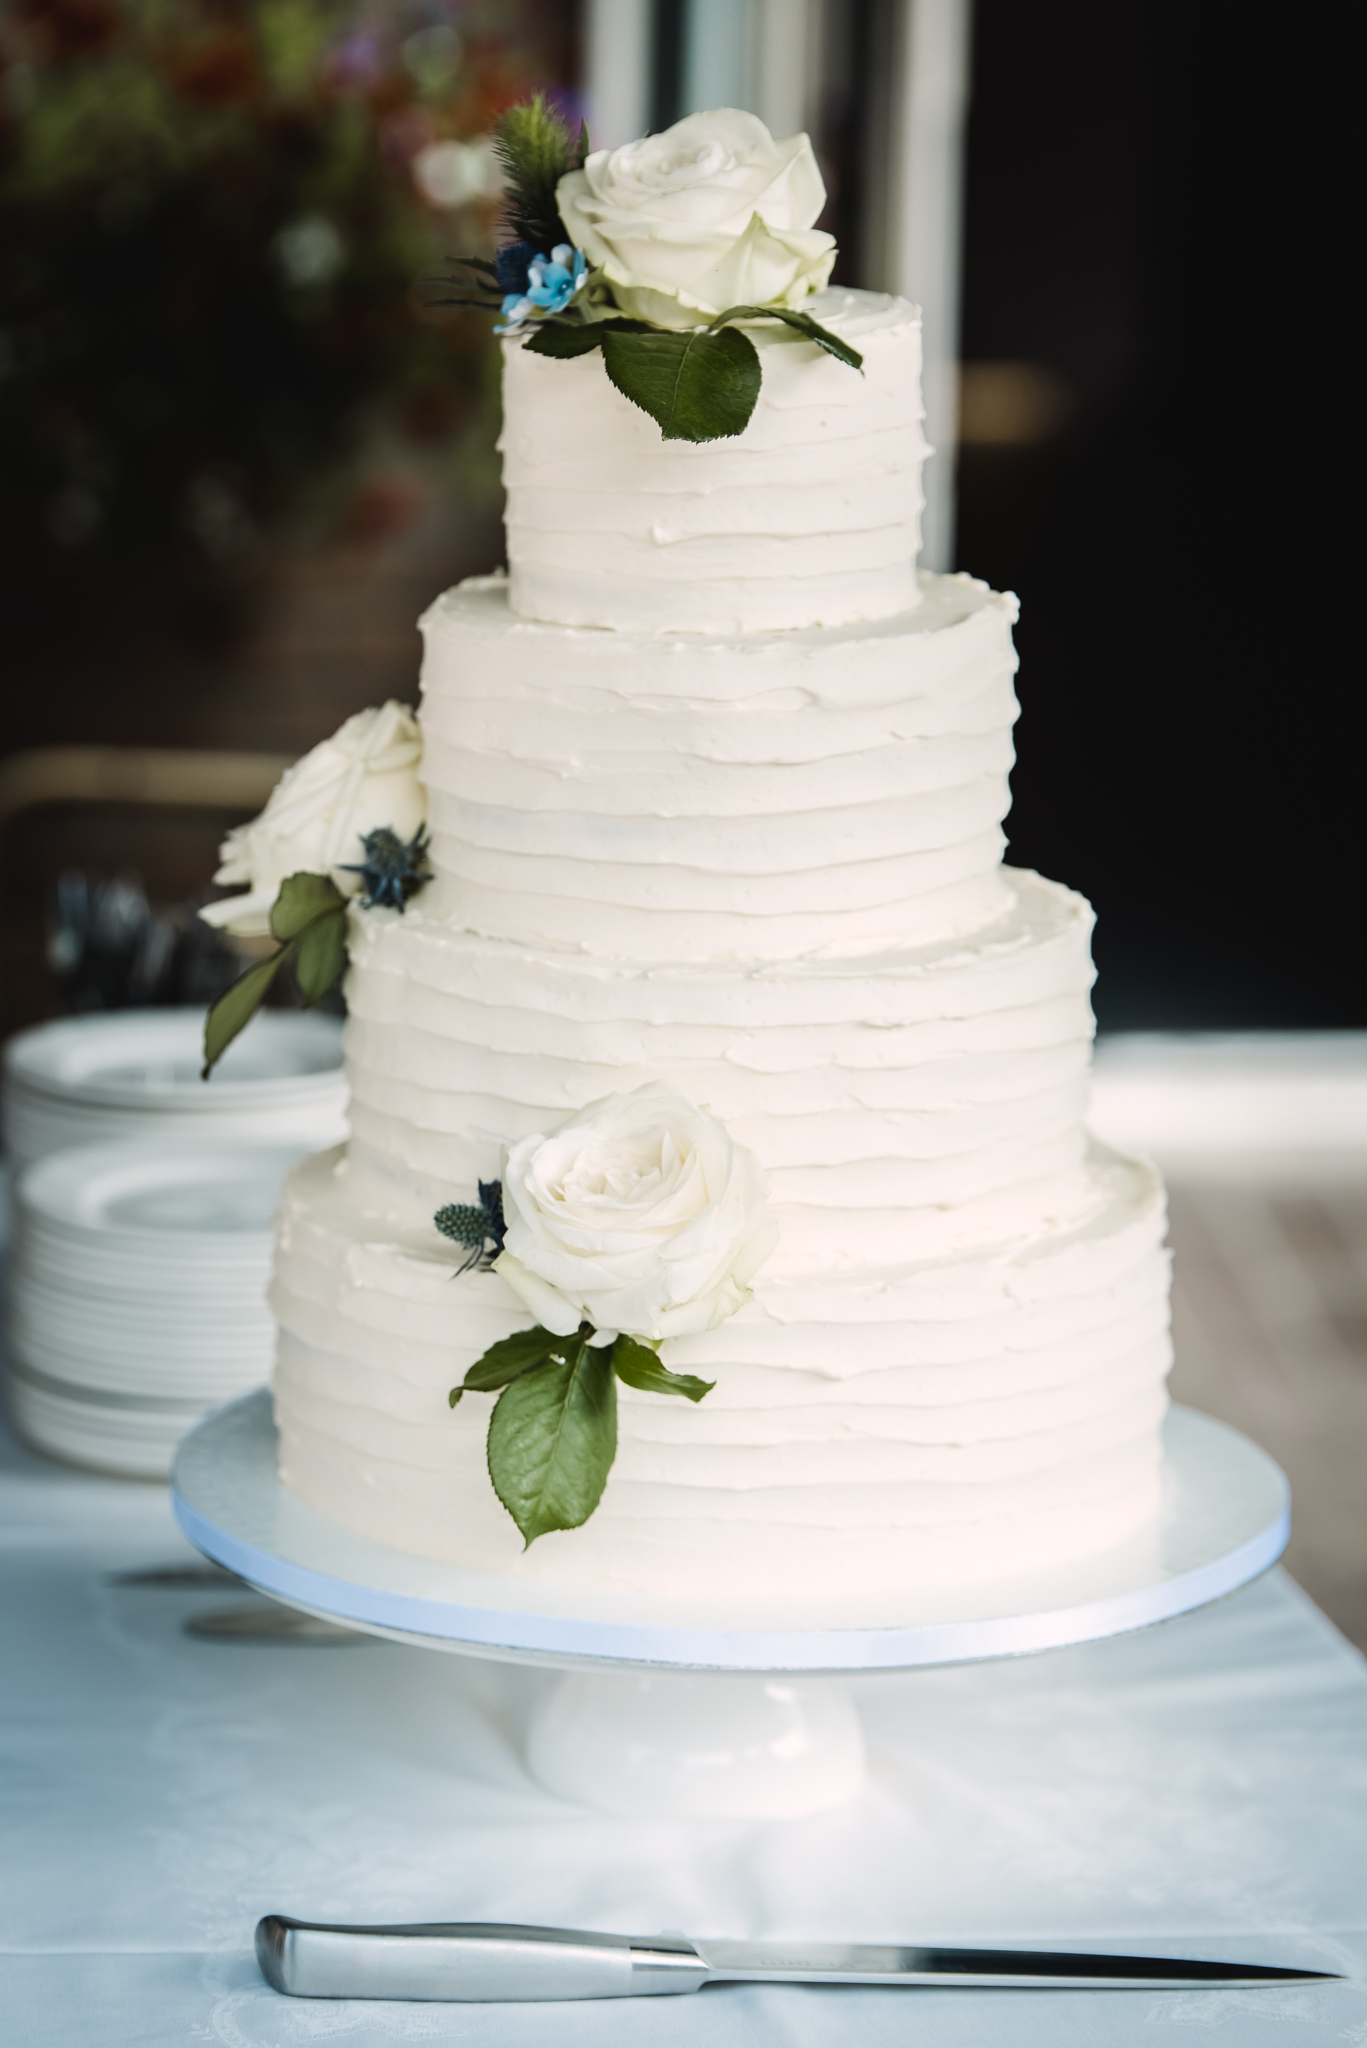 Rugketting bij je trouwjurk | Bruidskapsel, Bruids